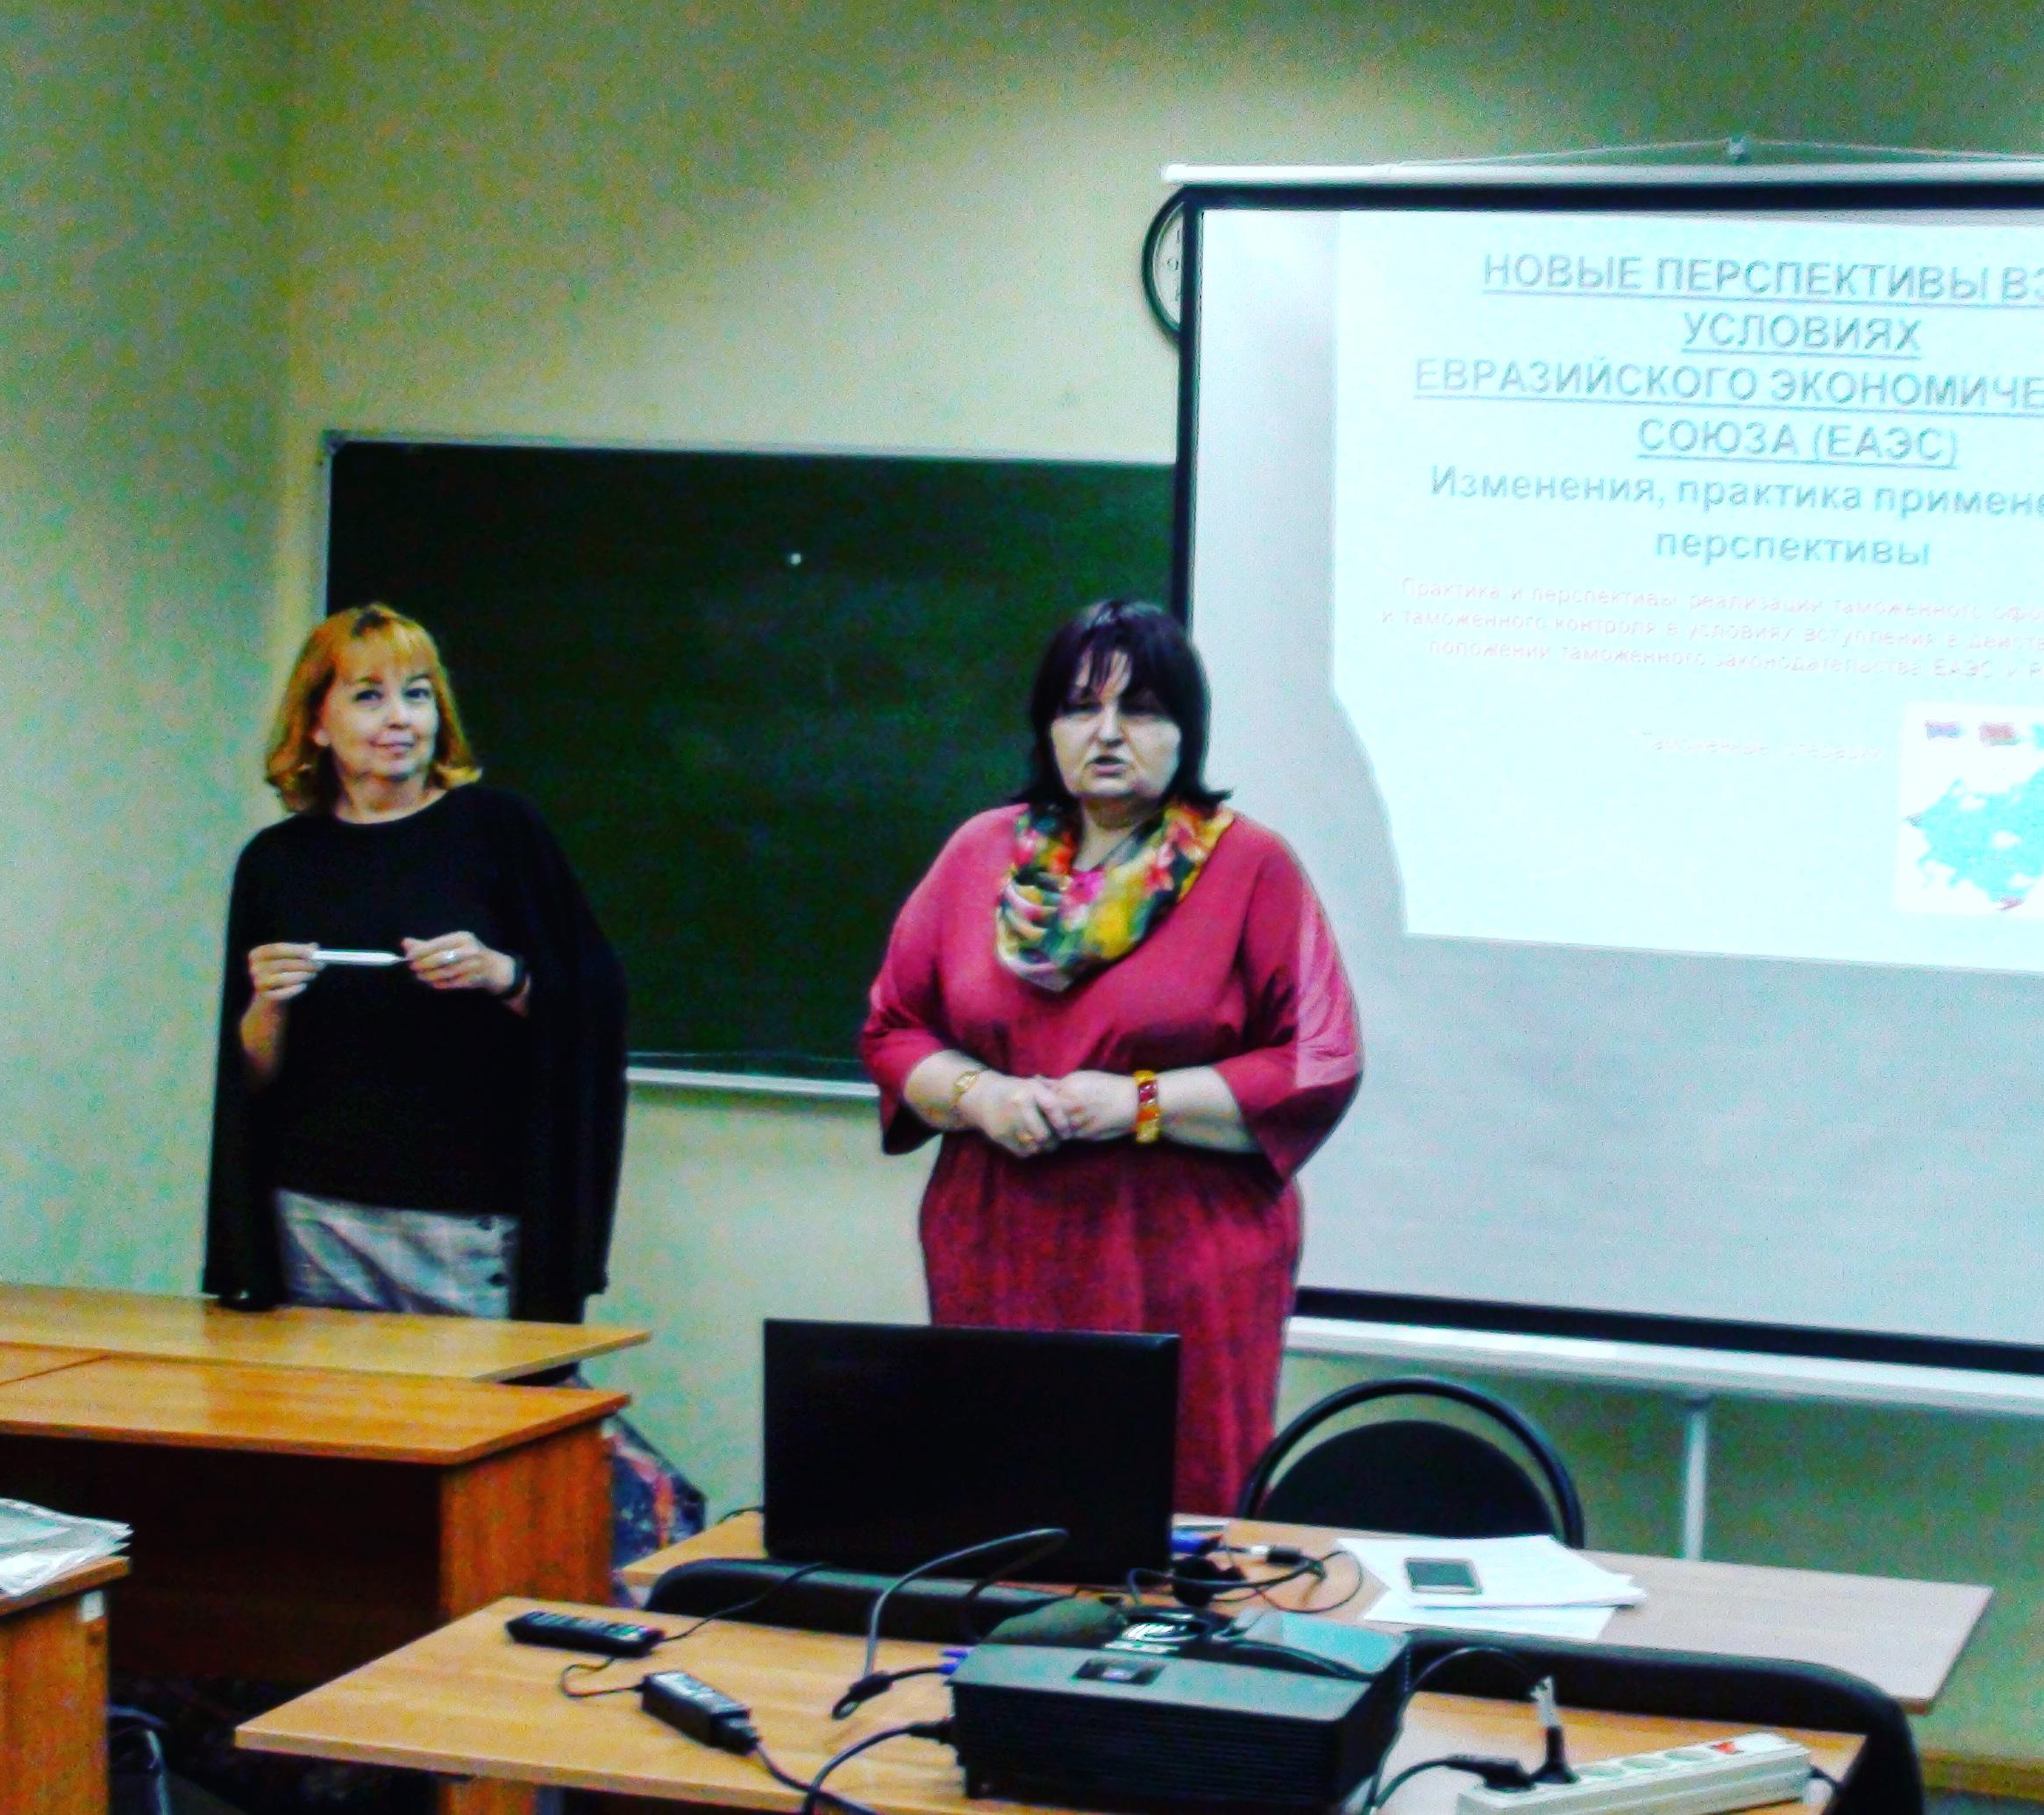 seminar september 2018